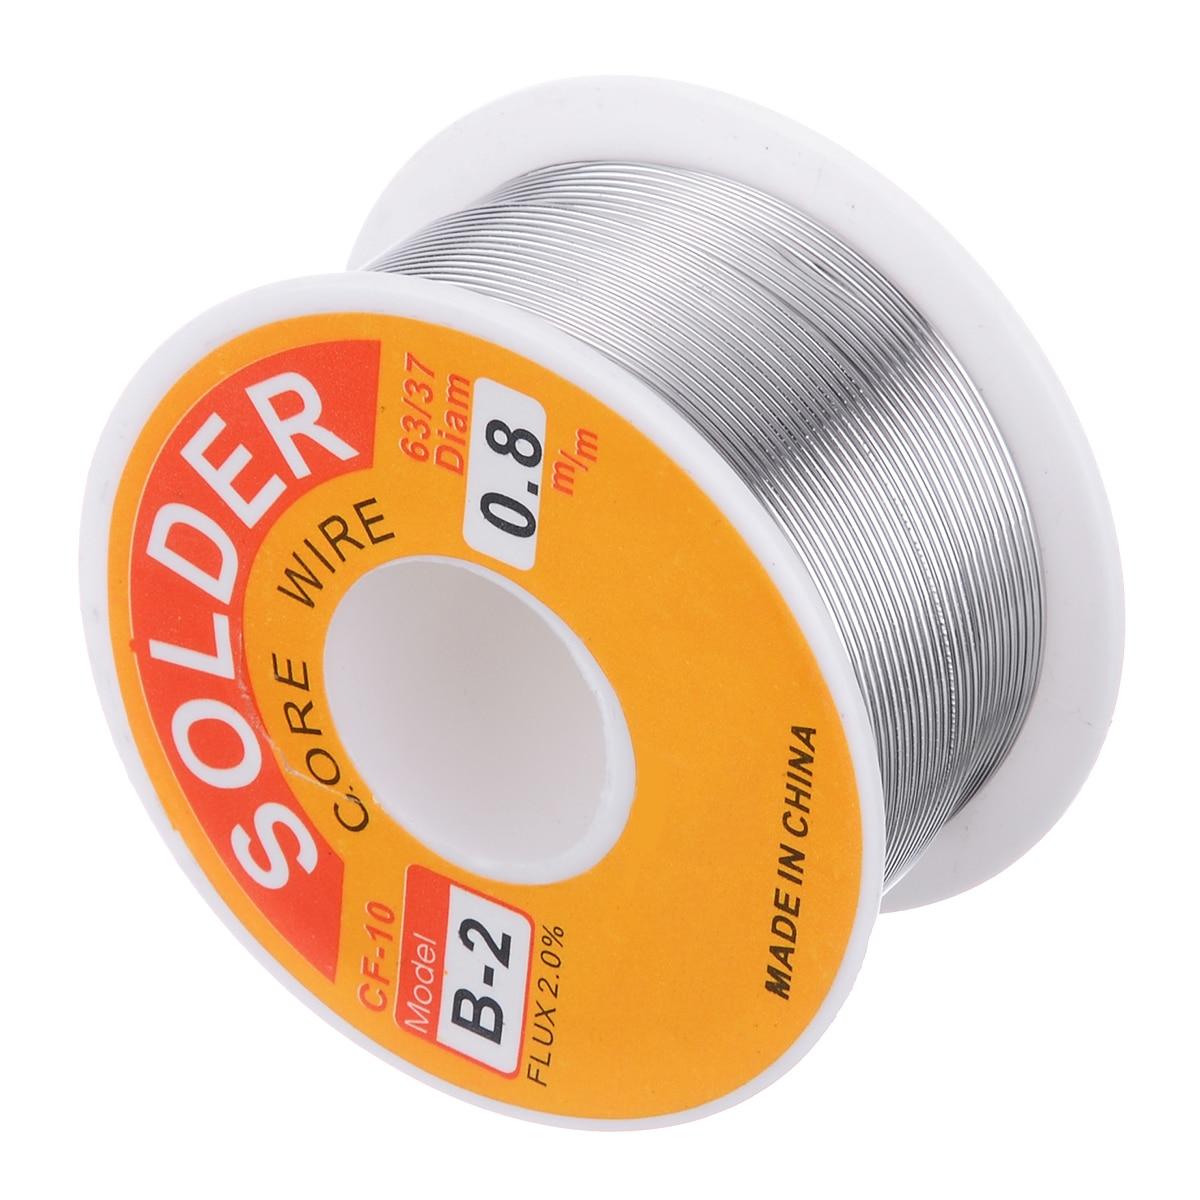 High Quality 63 37 Rosin Core Welding Flux 2% Tin Lead Solder Iron Wire Reel 0 8mm 1 0mm 50g 100g drone helipad